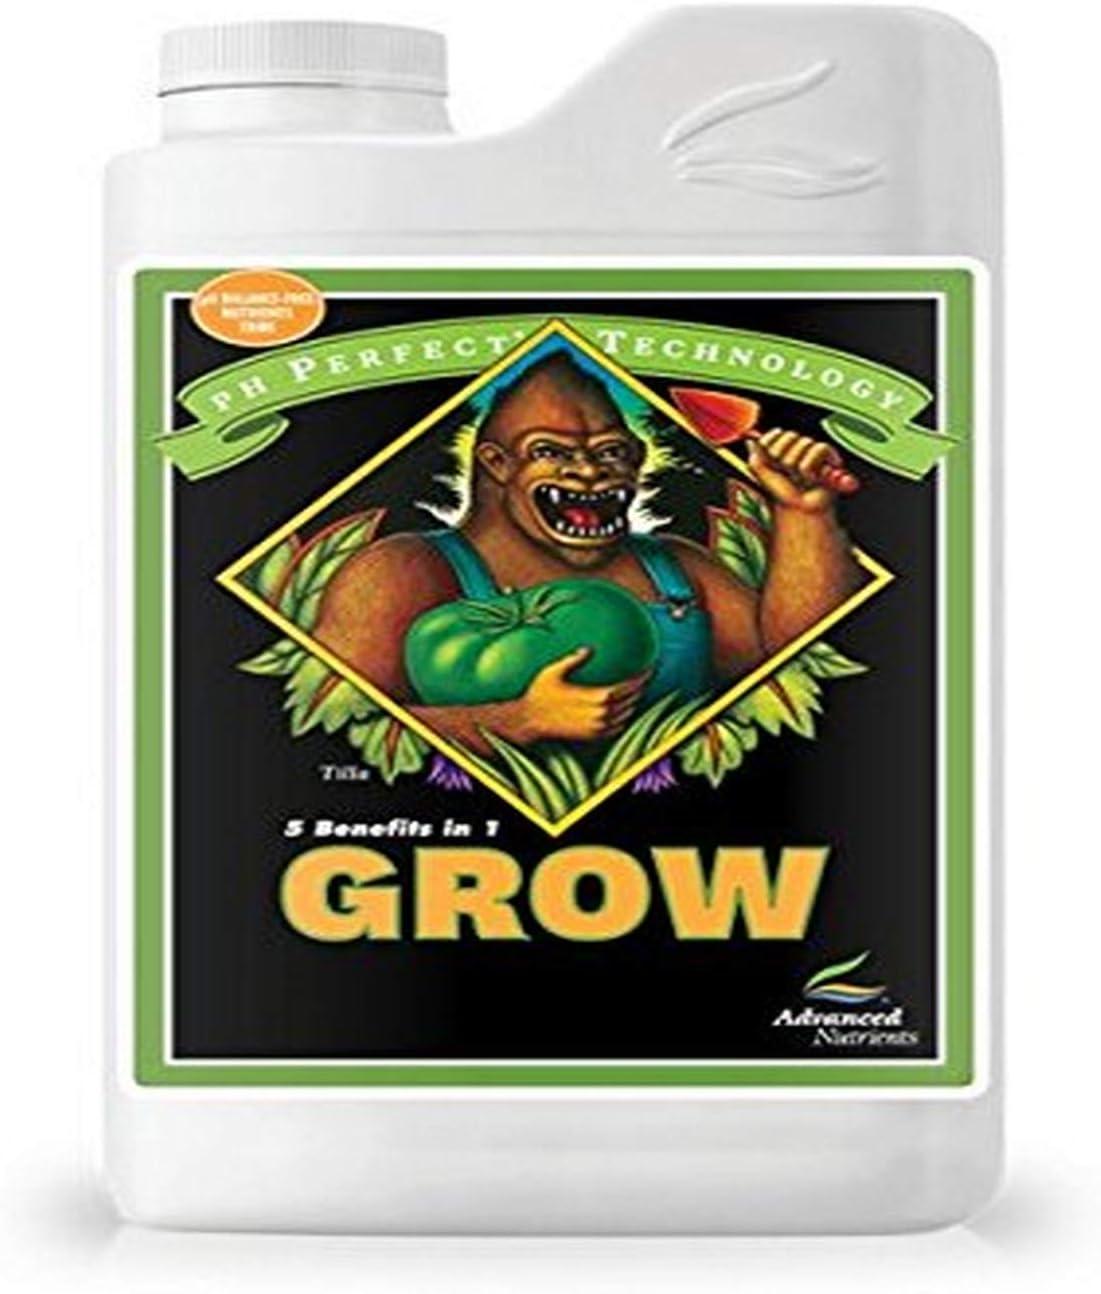 Advanced Nutrients 1301-14 Grow pH Perfect Fertilizer, 1 Liter, Brown/A